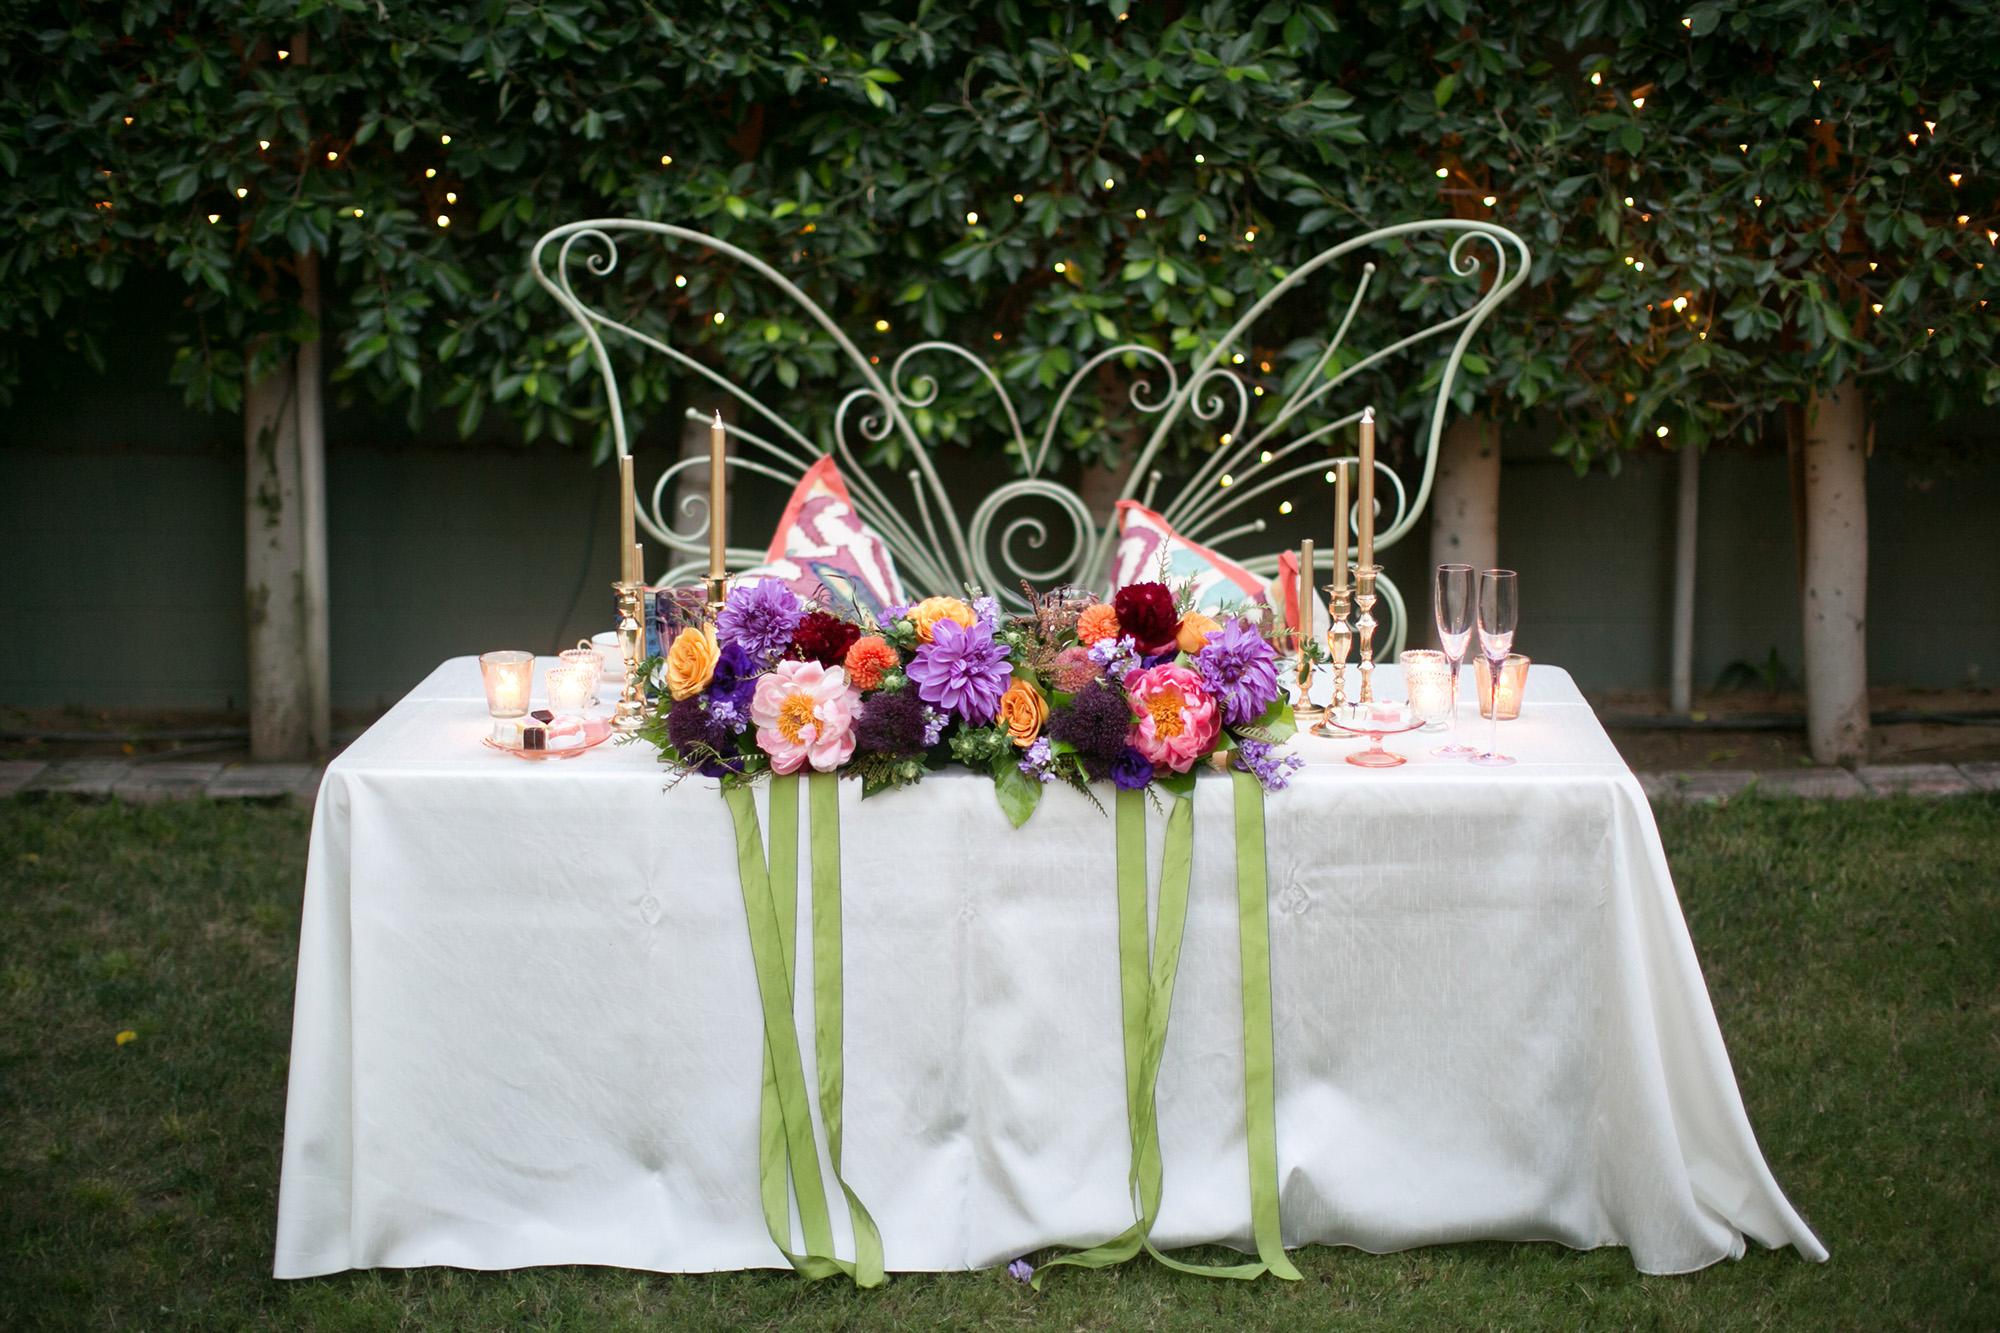 christmas-house-weddings-receptions-carrie-vines-163.jpg